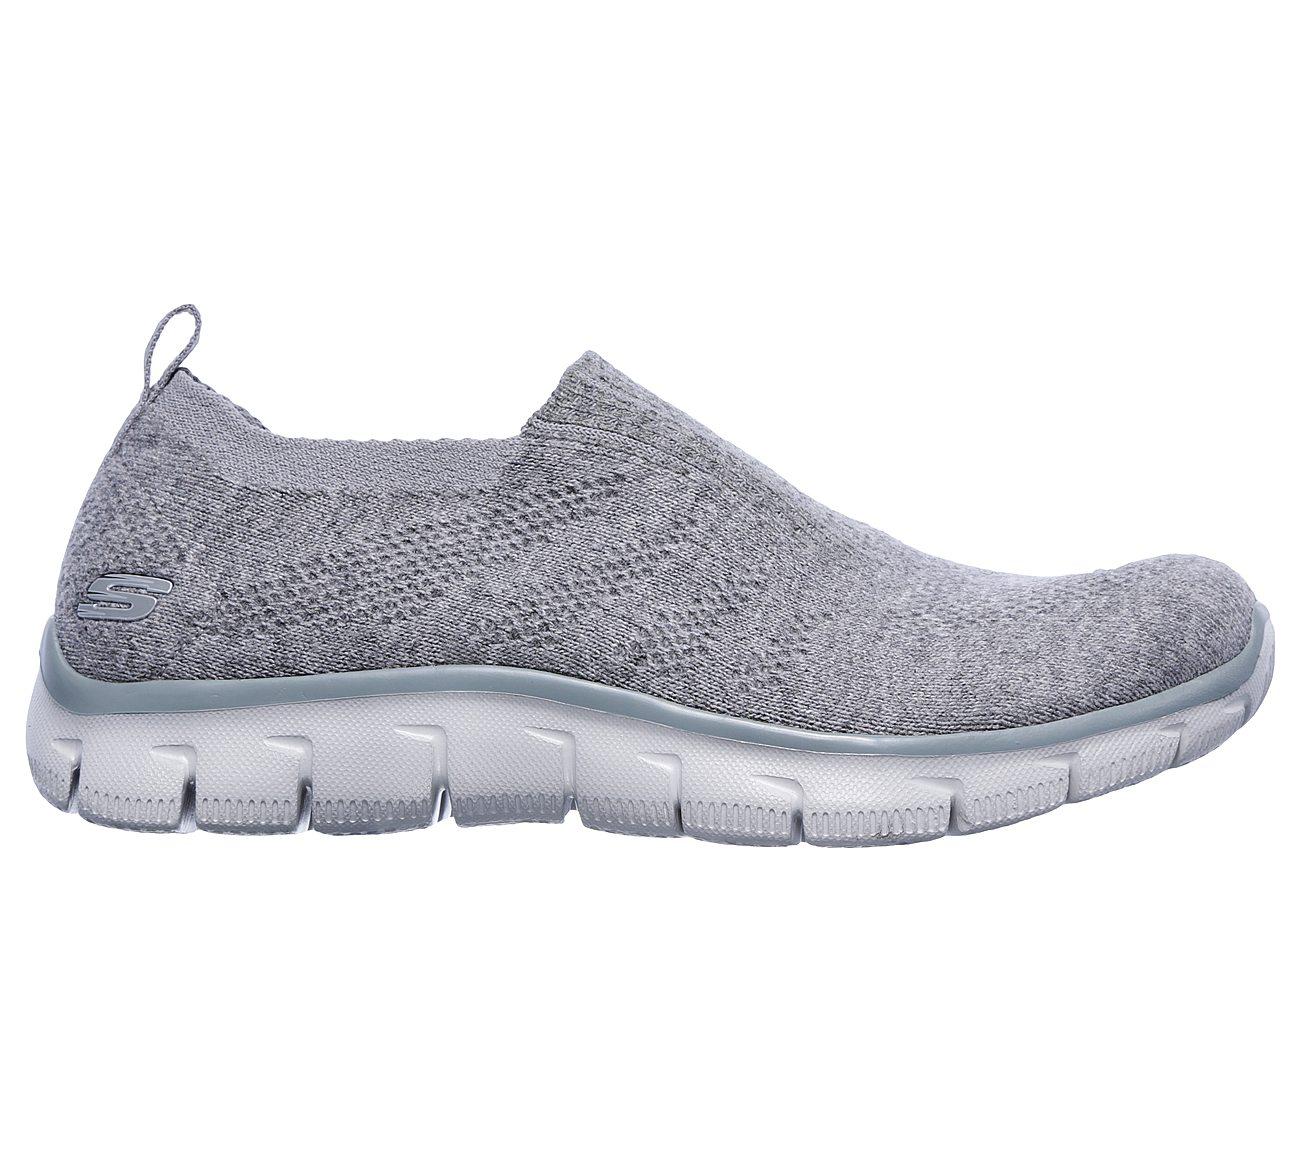 Buy SKECHERS Empire SKECHERS Sport Shoes